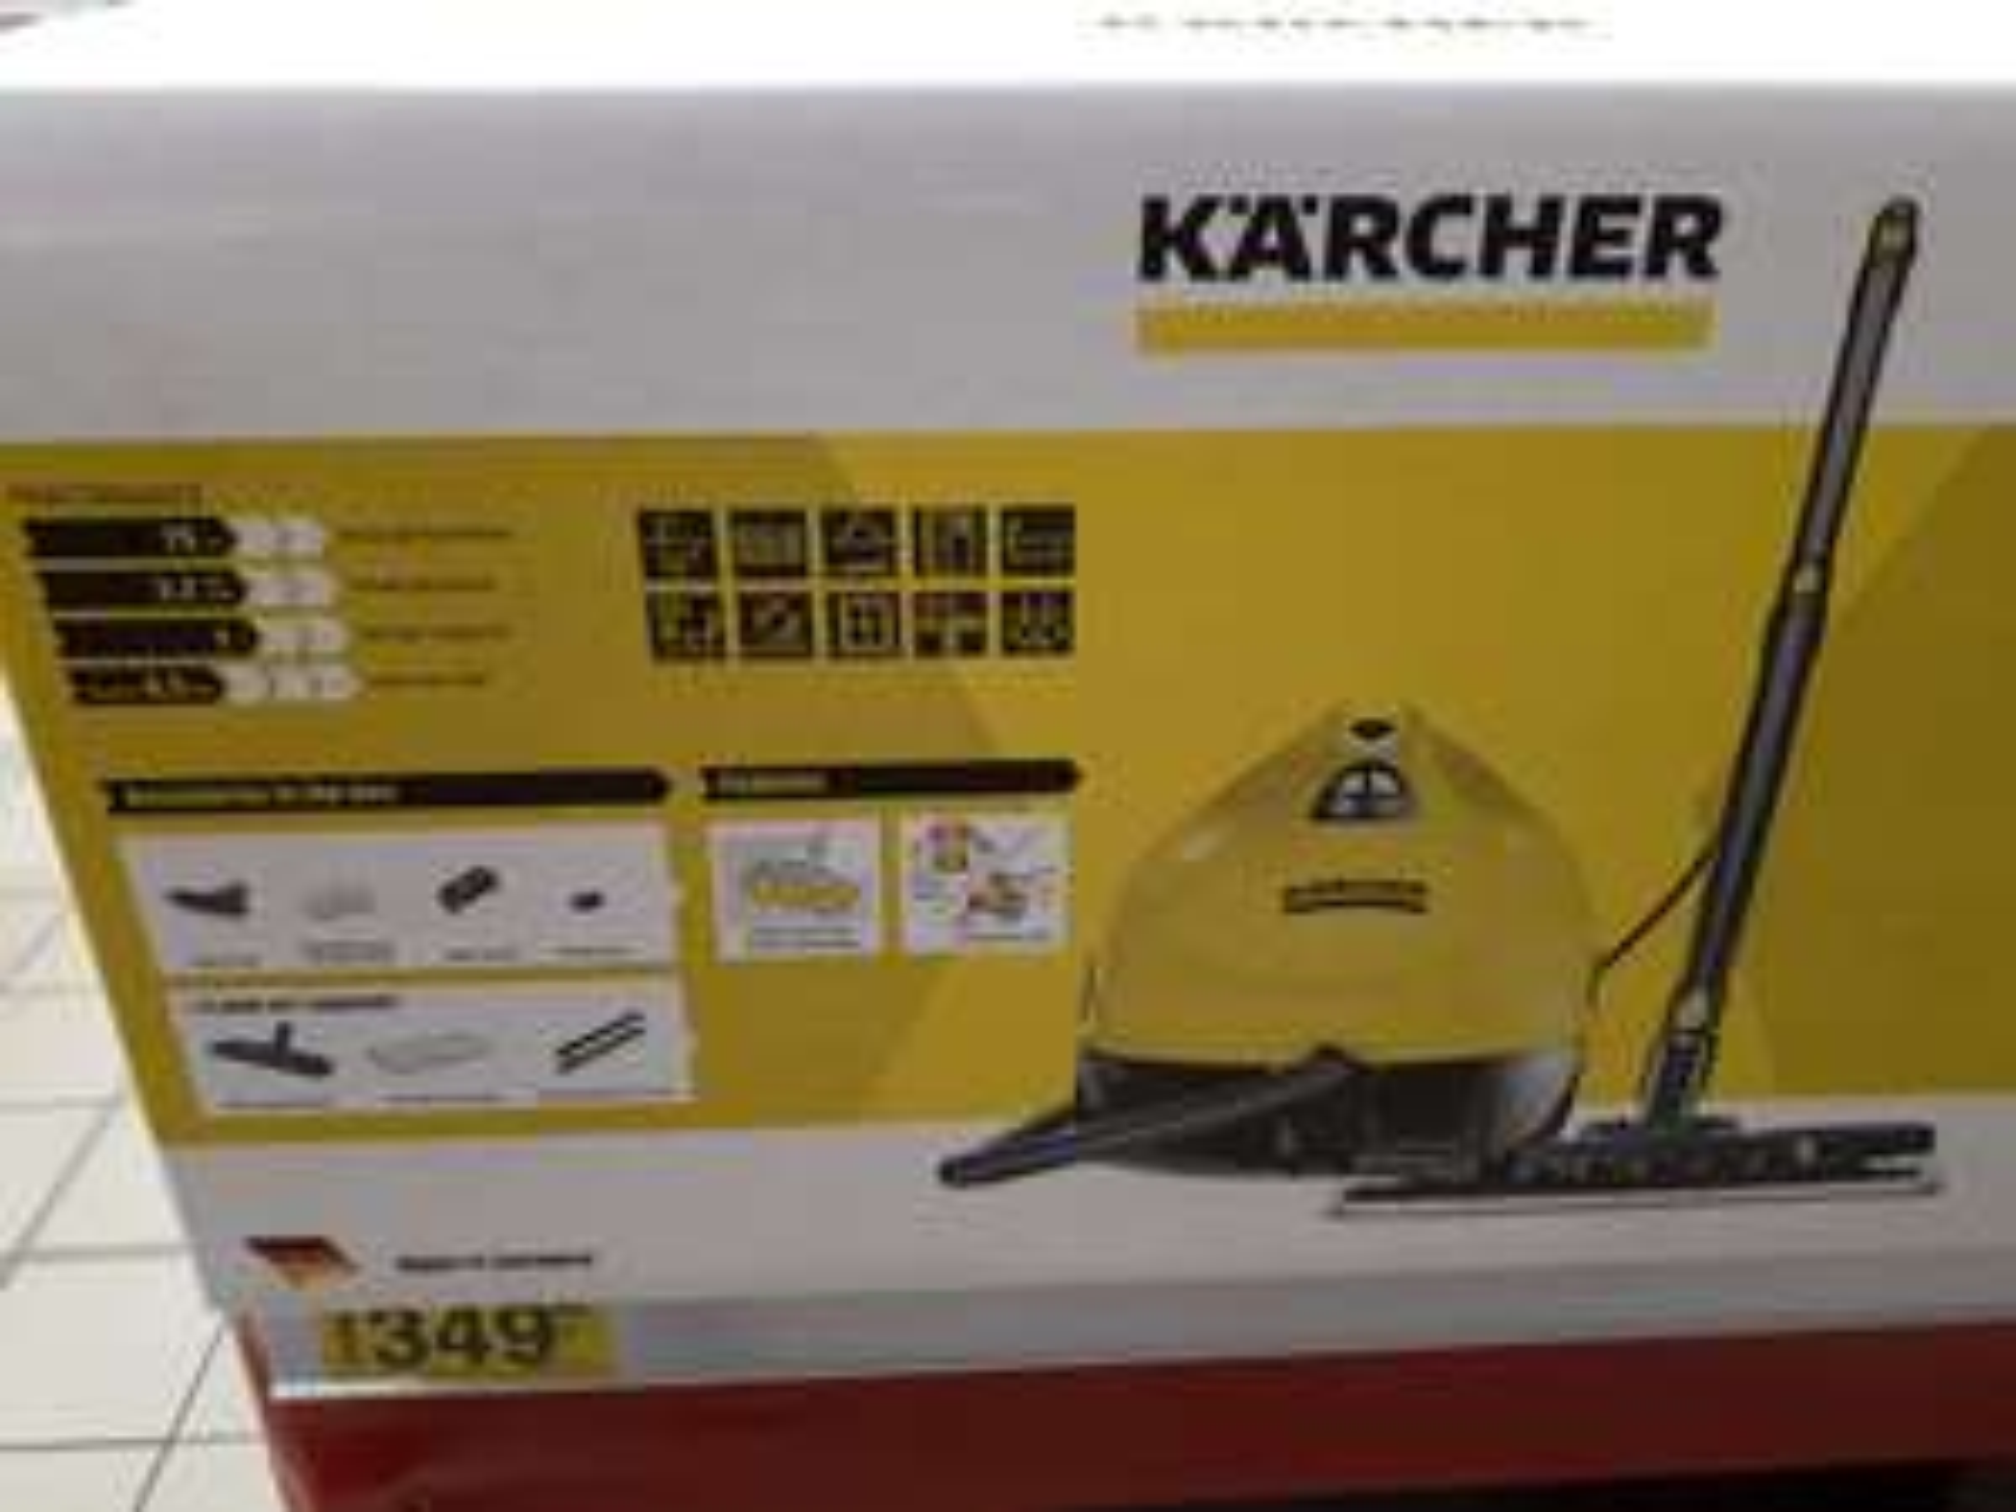 Parownica Karcher KST 2 - Carefour